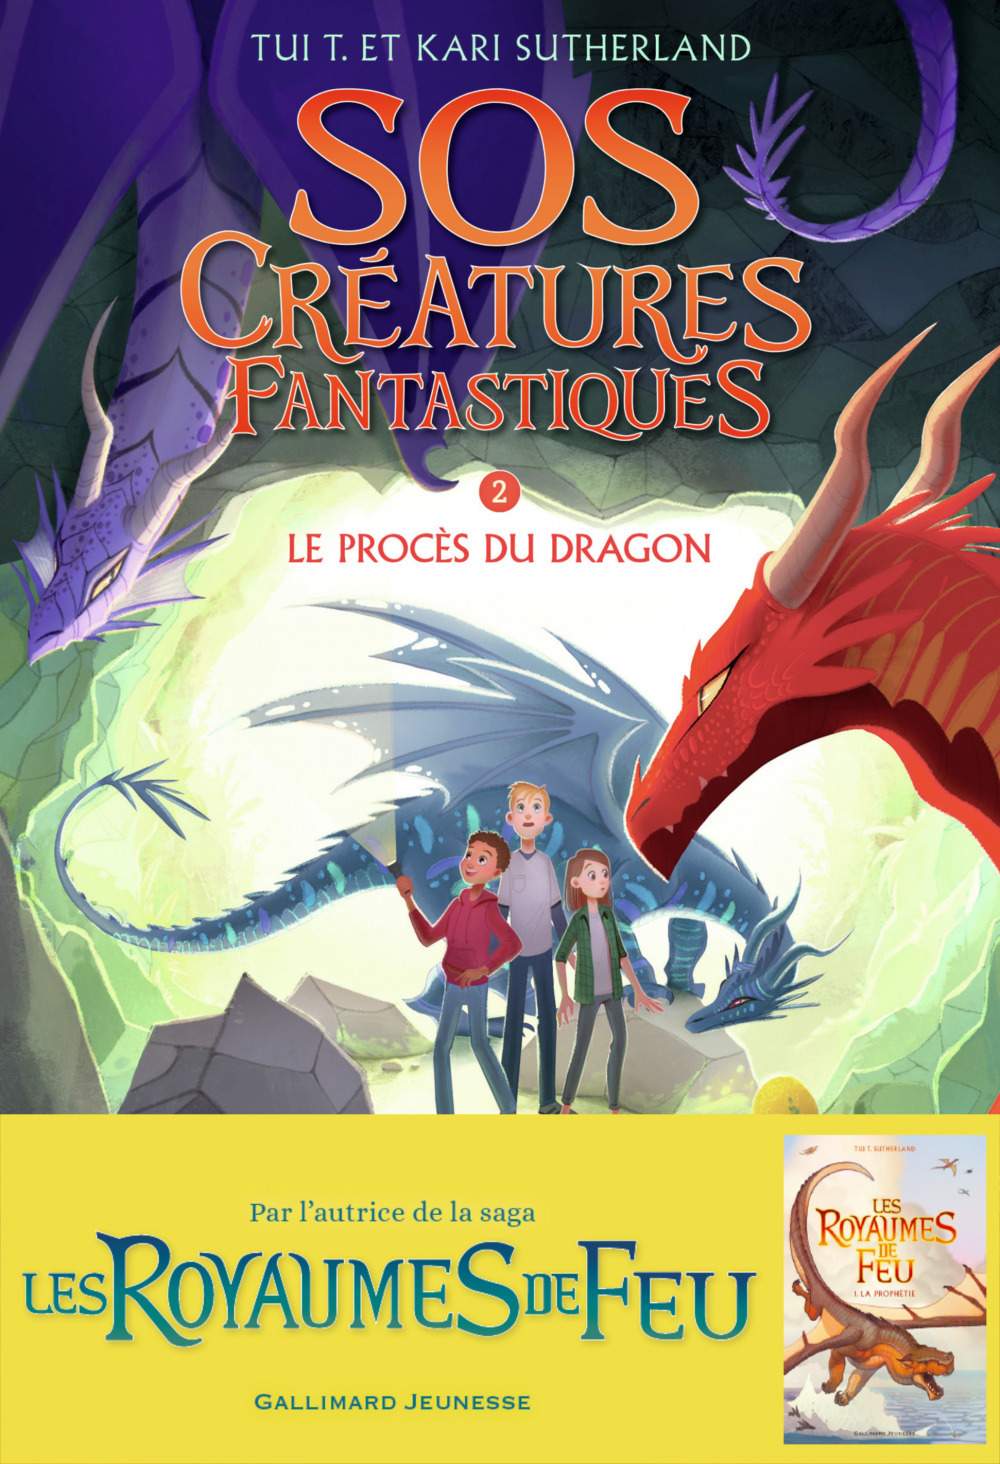 sos creatures fantastiques 2 - le proces du dragon